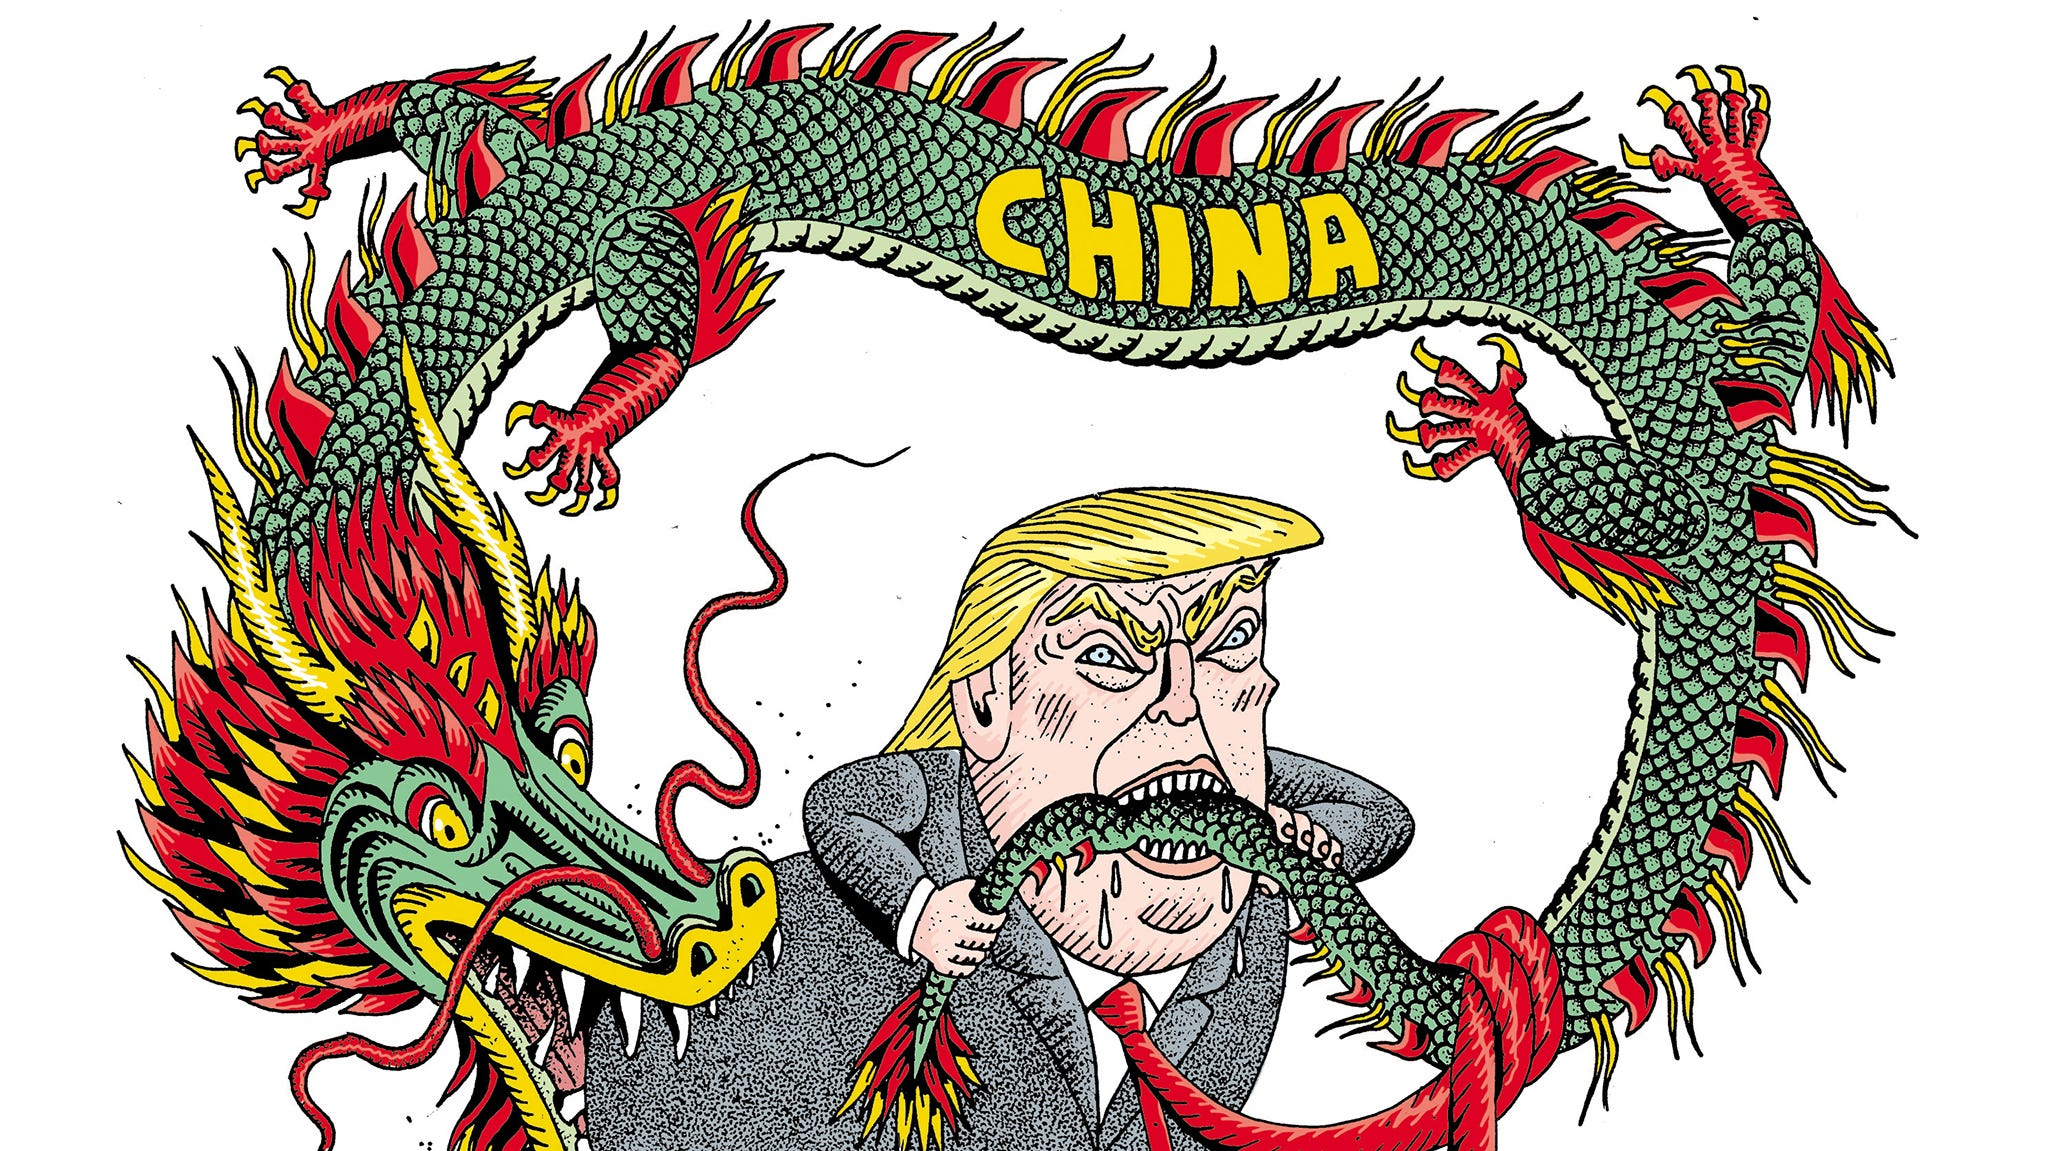 Cartoon on China tariffs